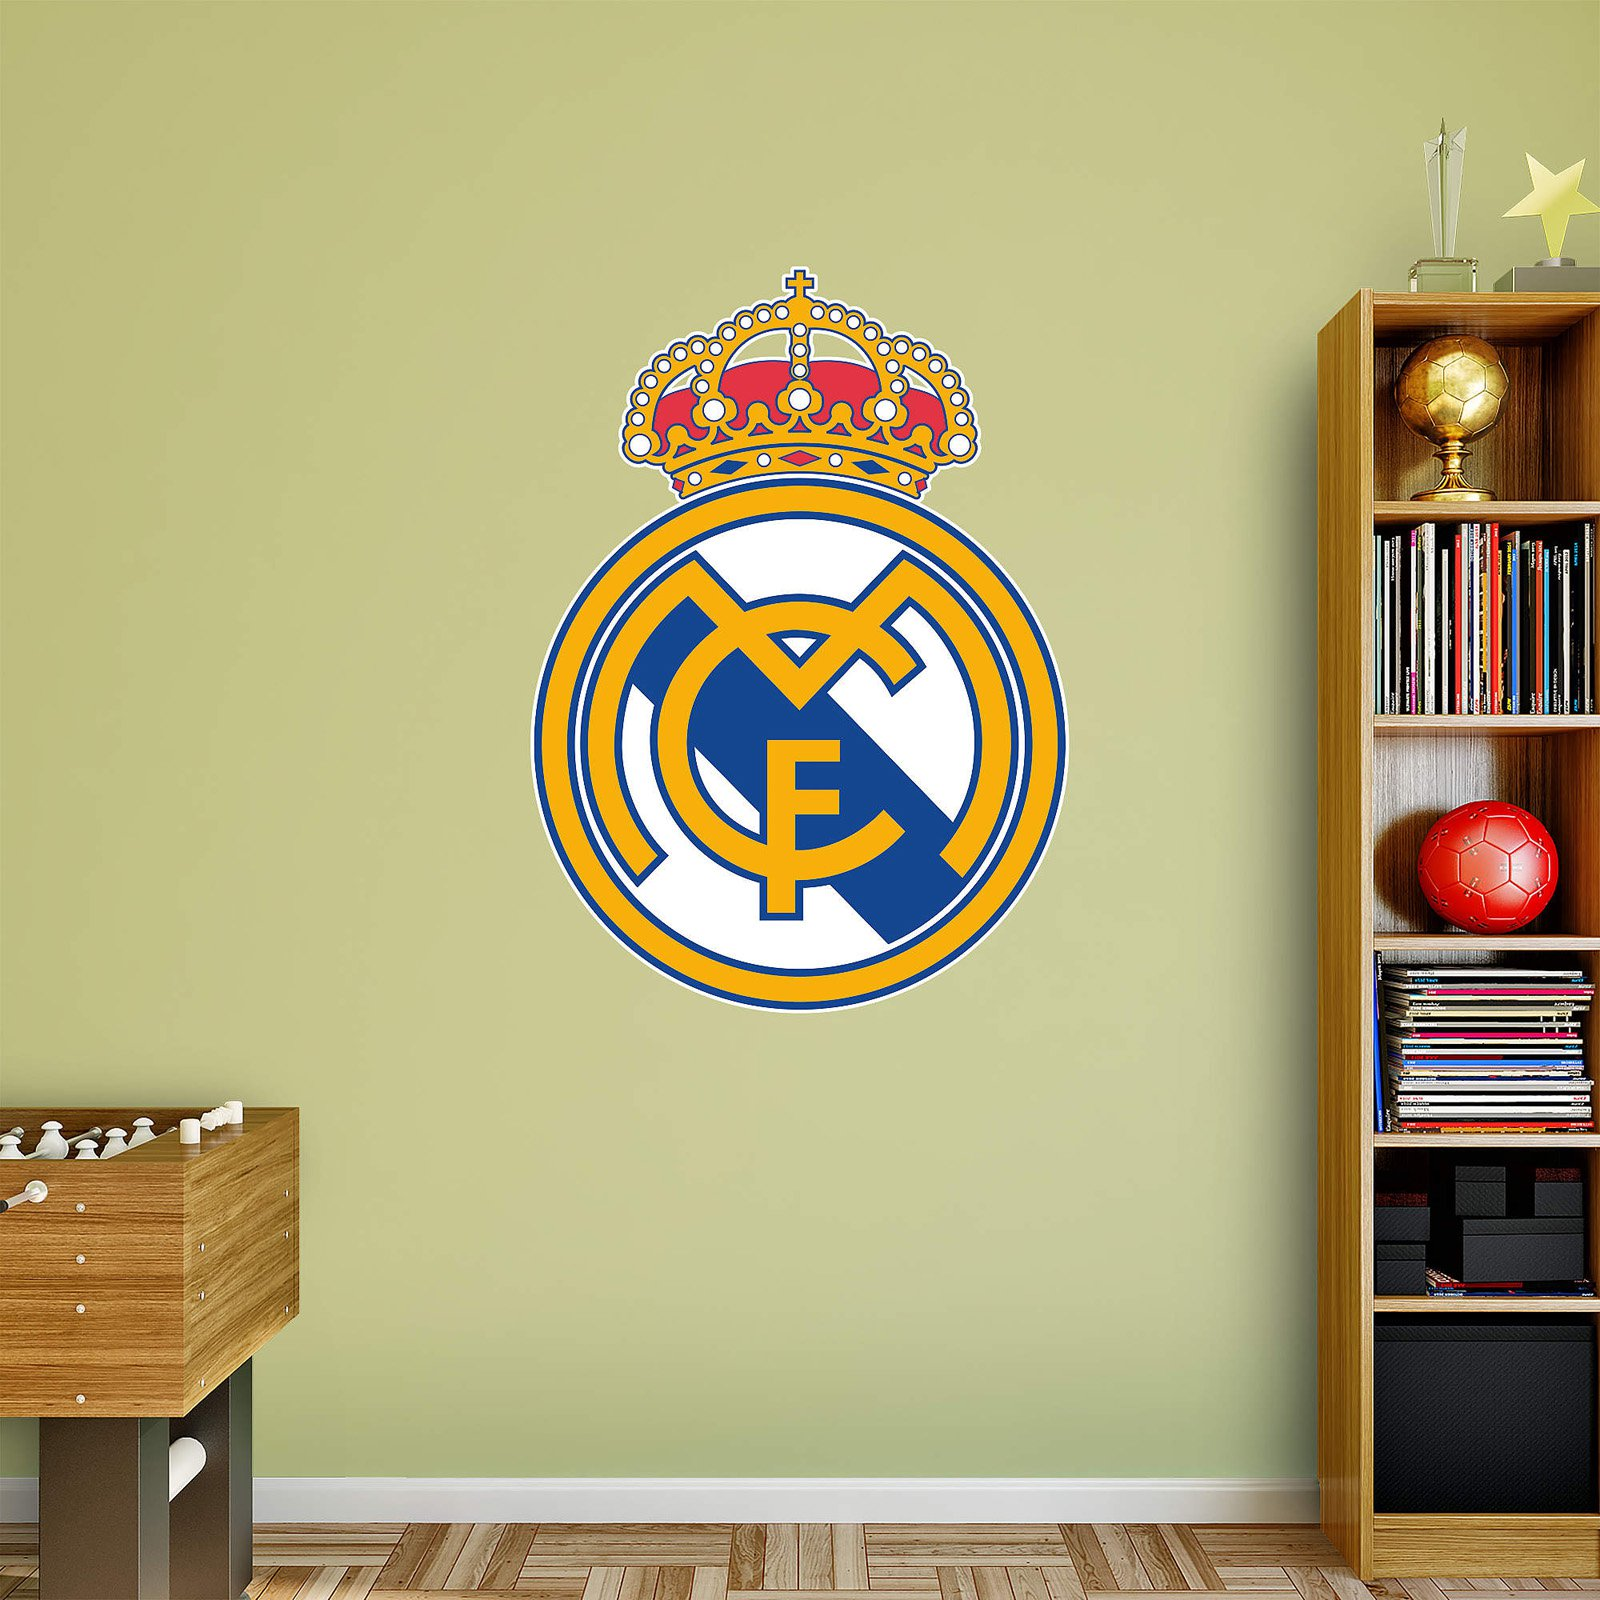 Fathead Real Madrid Logo Wall Decal - Walmart.com